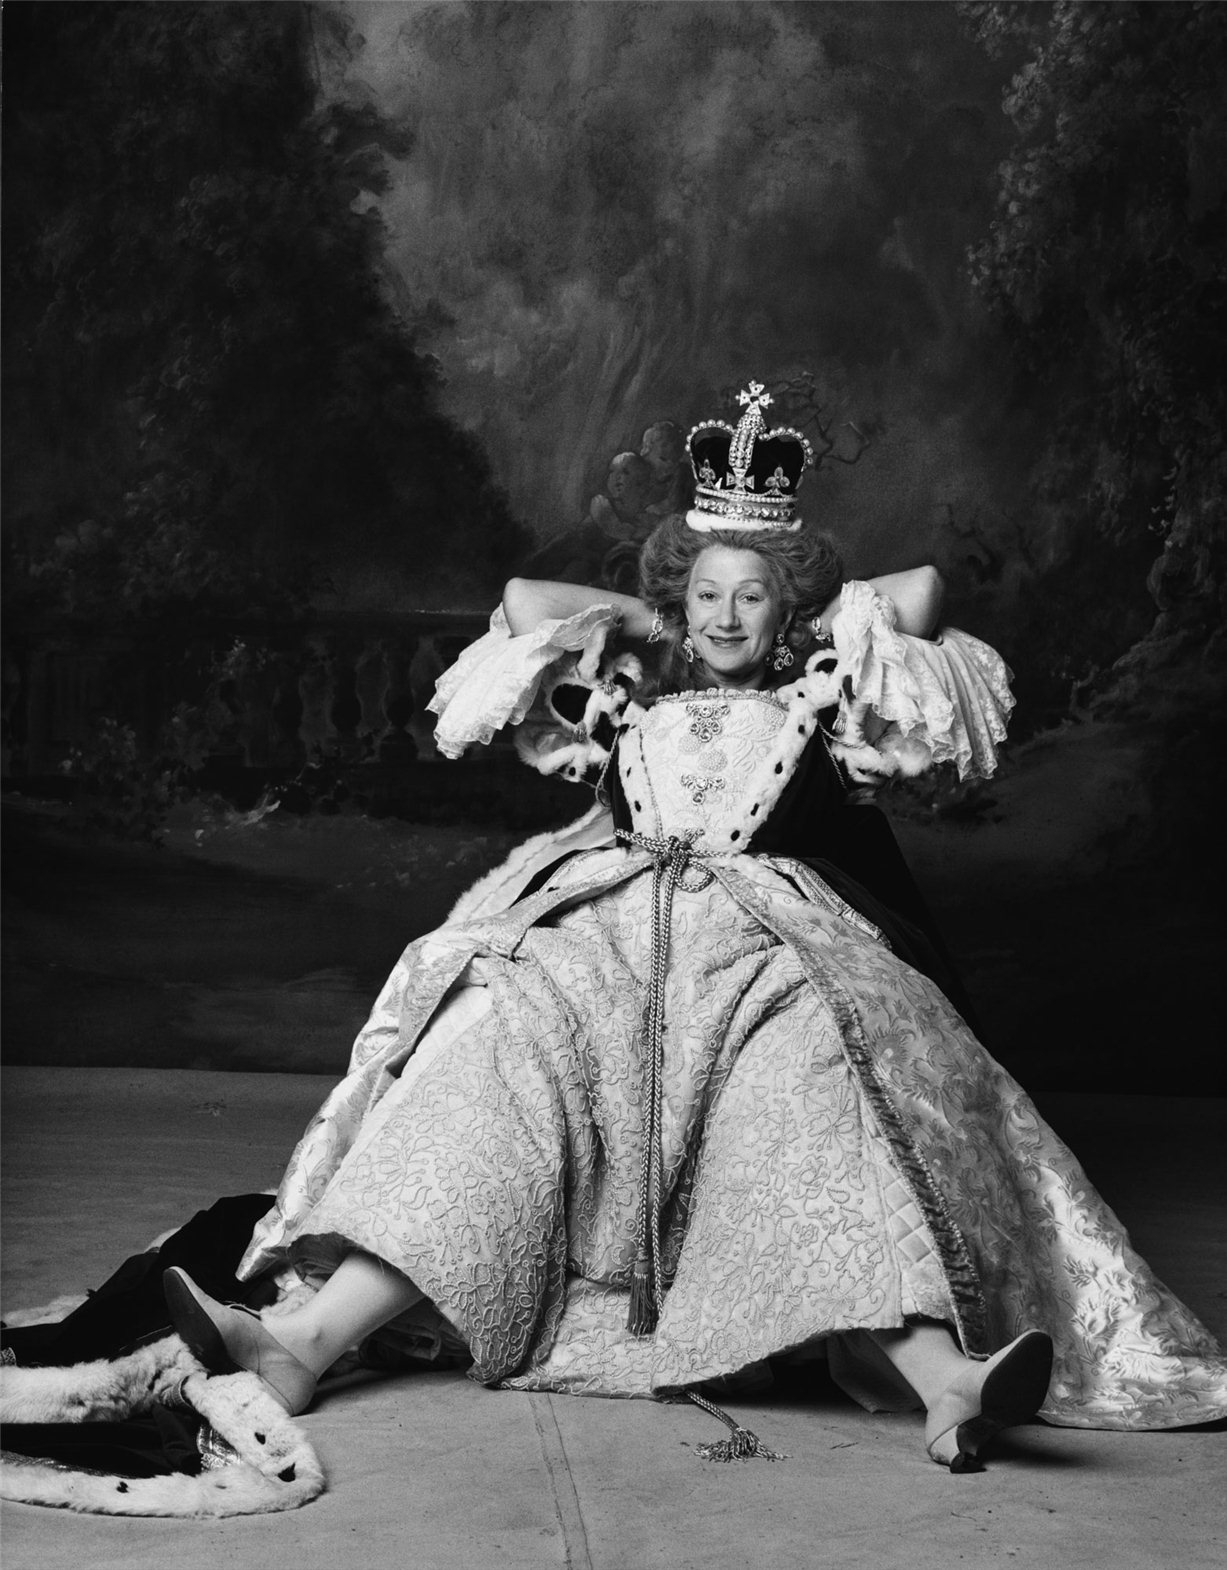 Helen Mirren / Хелен Миррен - звезды Голливуда, фотограф Firooz Zahedi